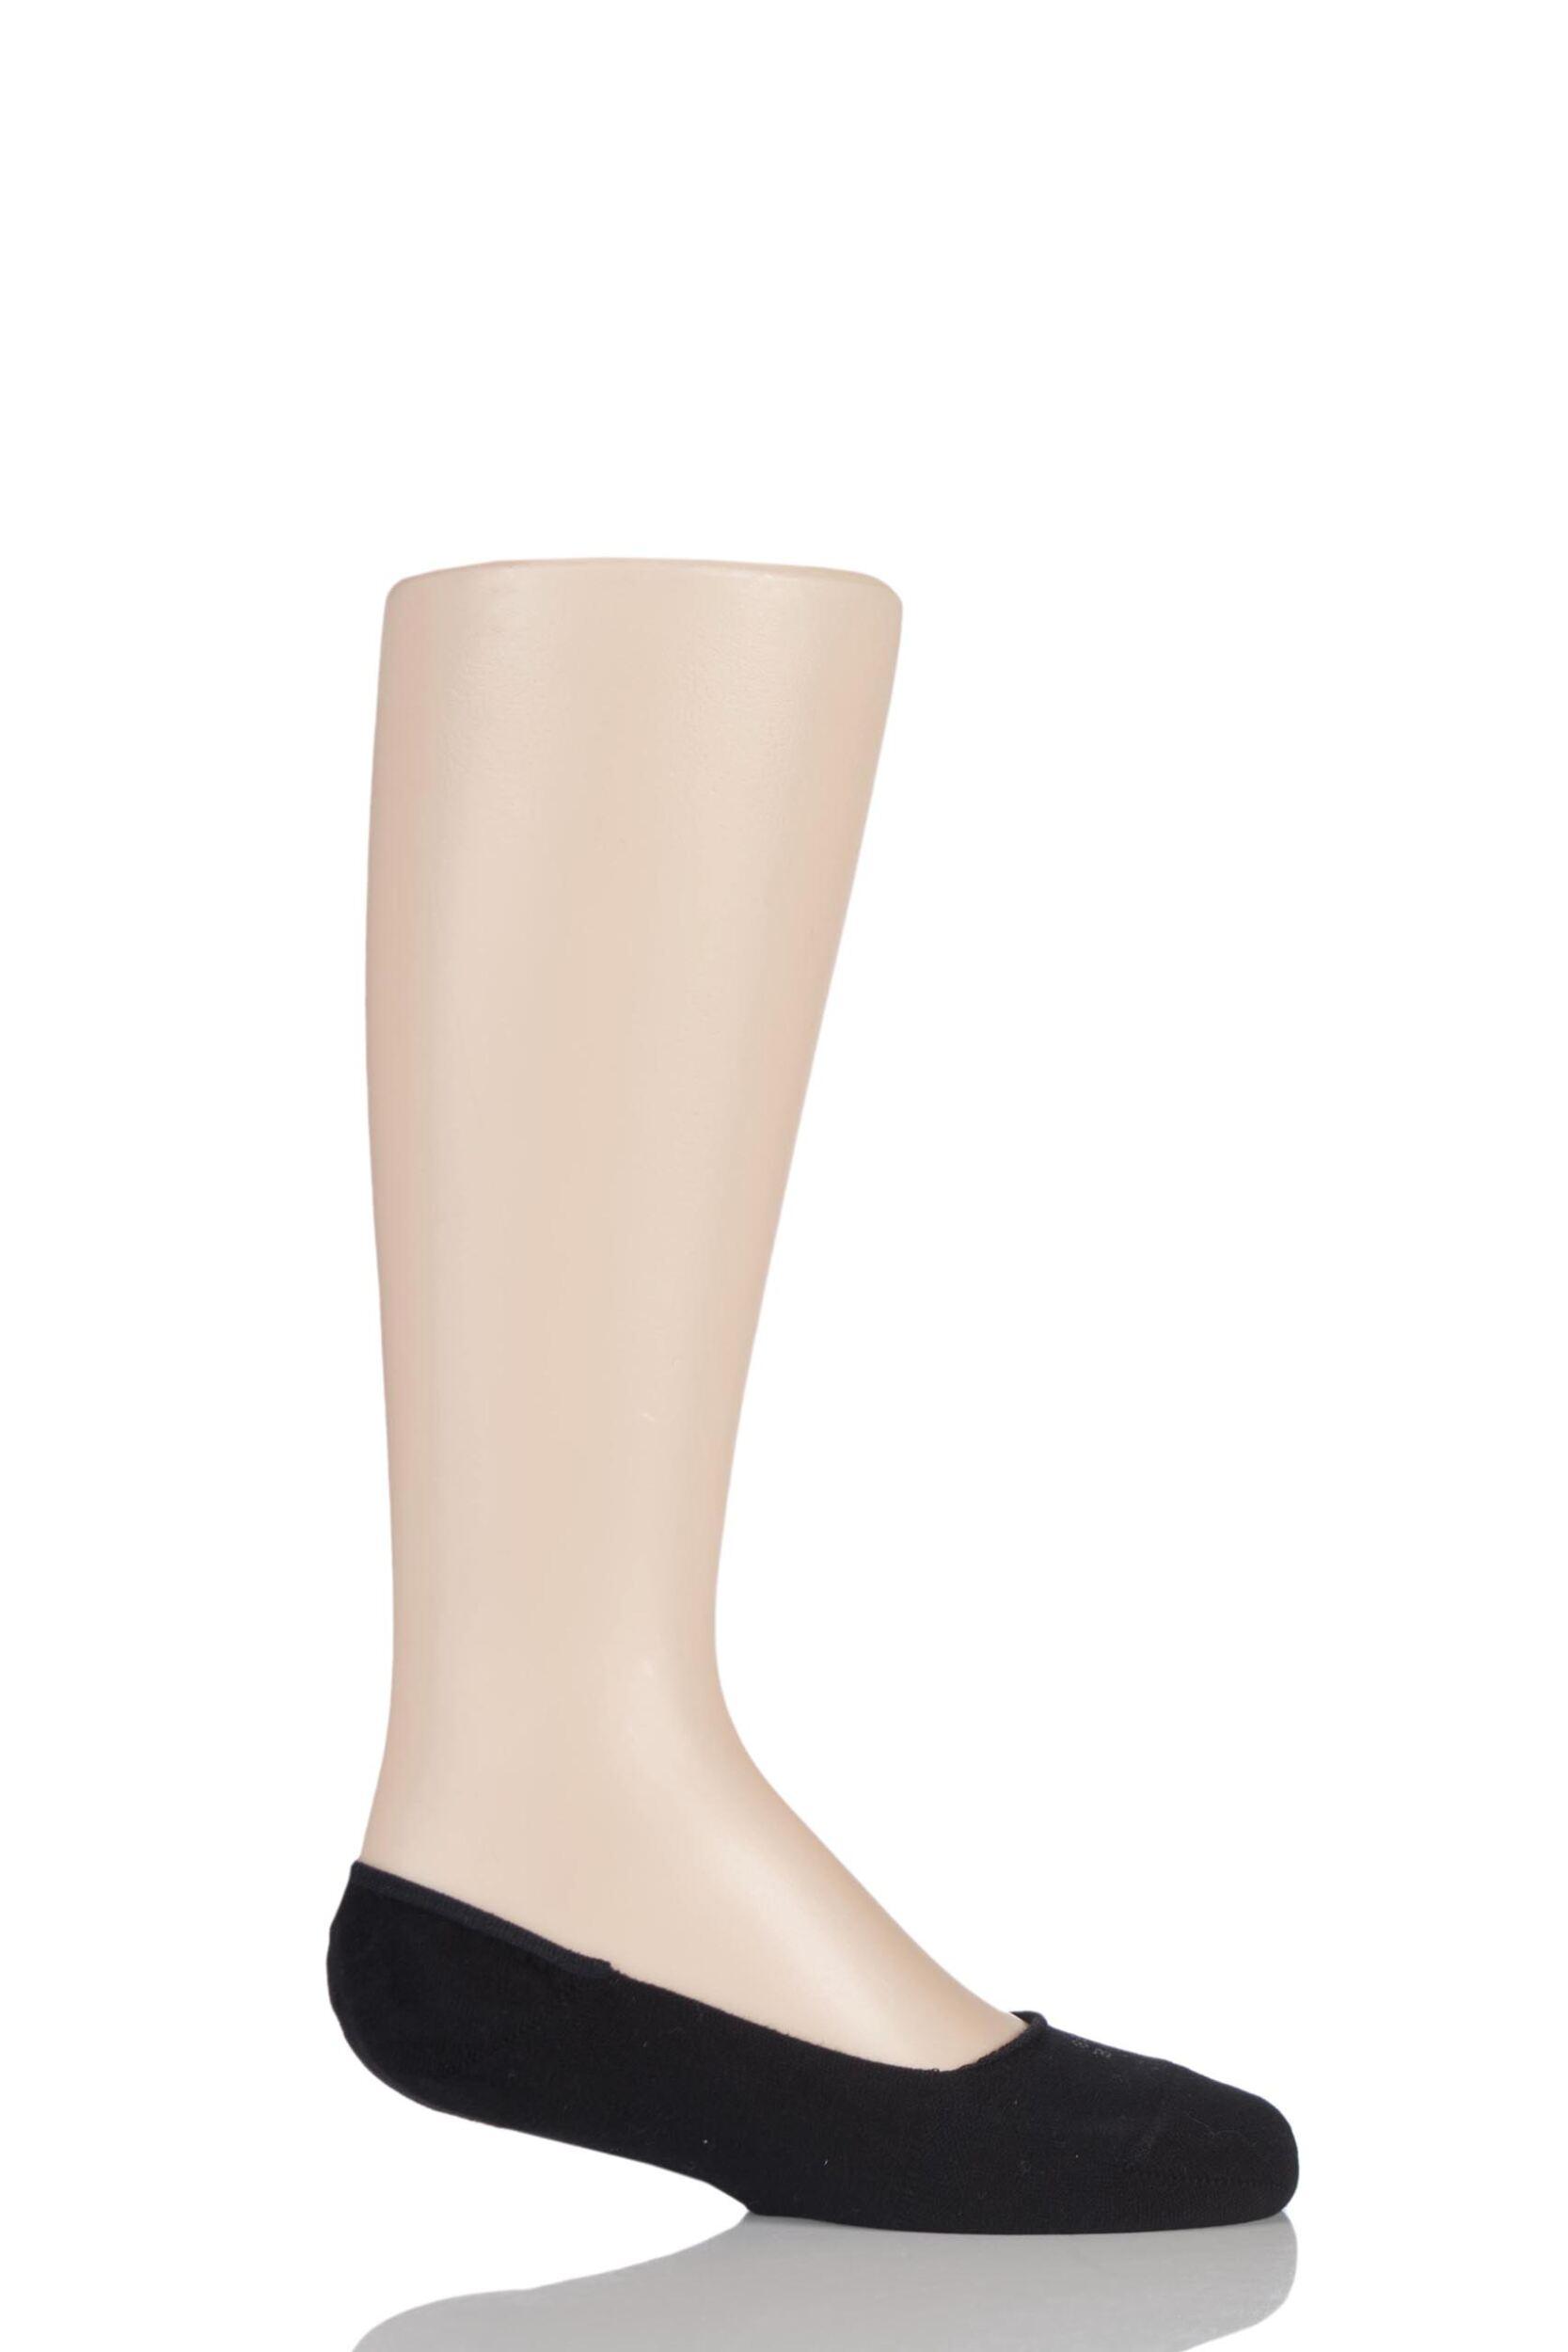 1 Pair Black Invisible Step Shoe Liners Kids Unisex 5.5-8 Teens (13-14 Years) - Falke